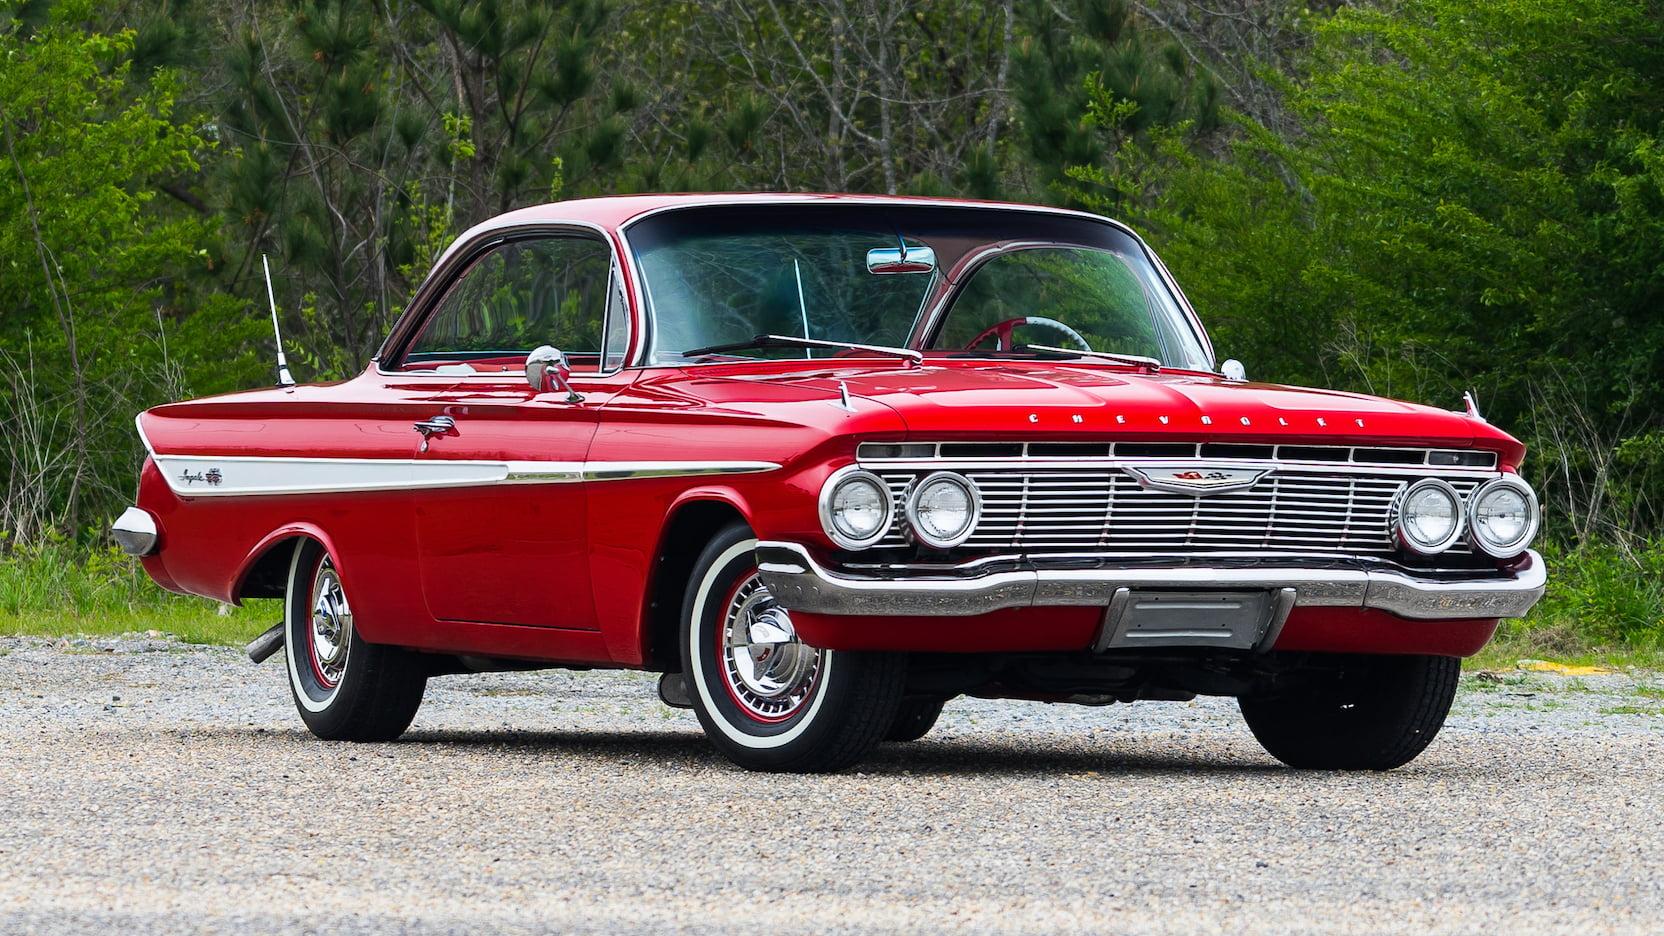 1961 Chevrolet Impala SS front 3/4